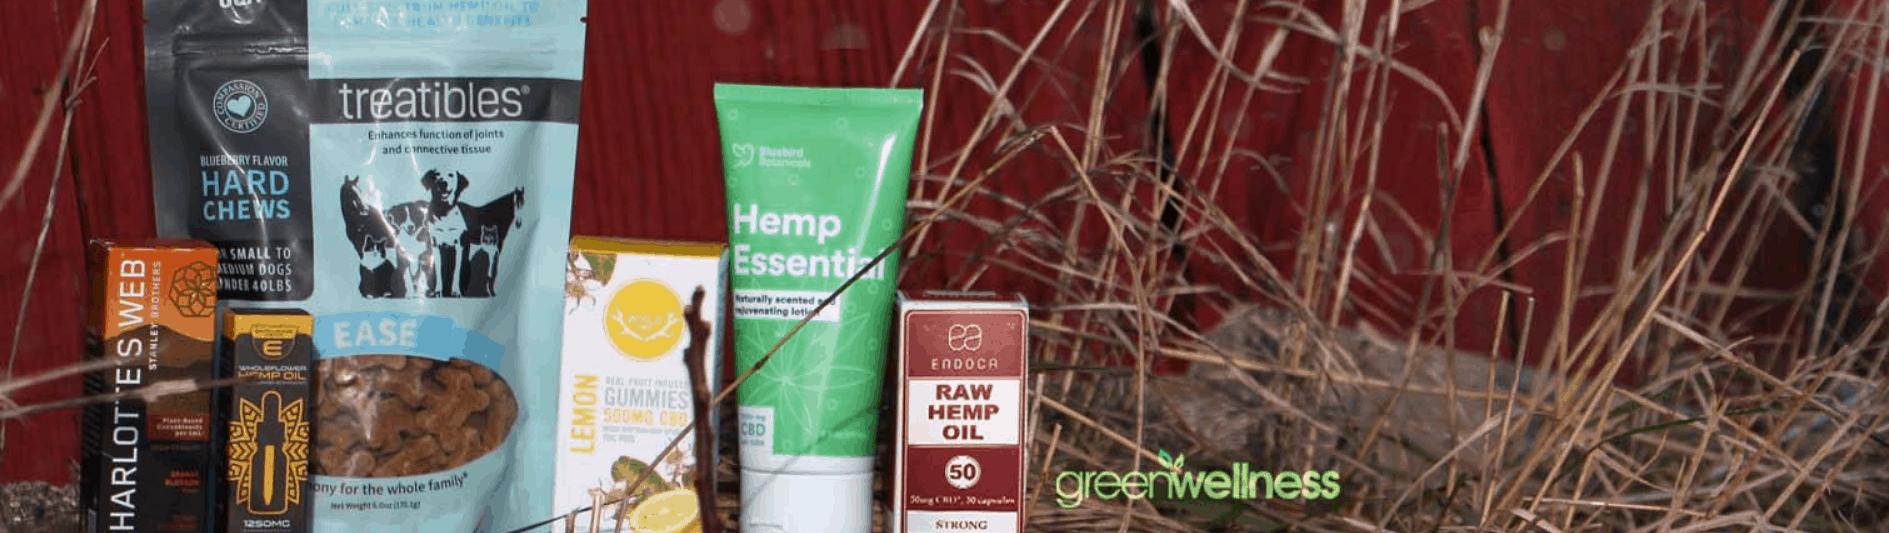 Green Wellness Life CBD Coupon Code Products Range